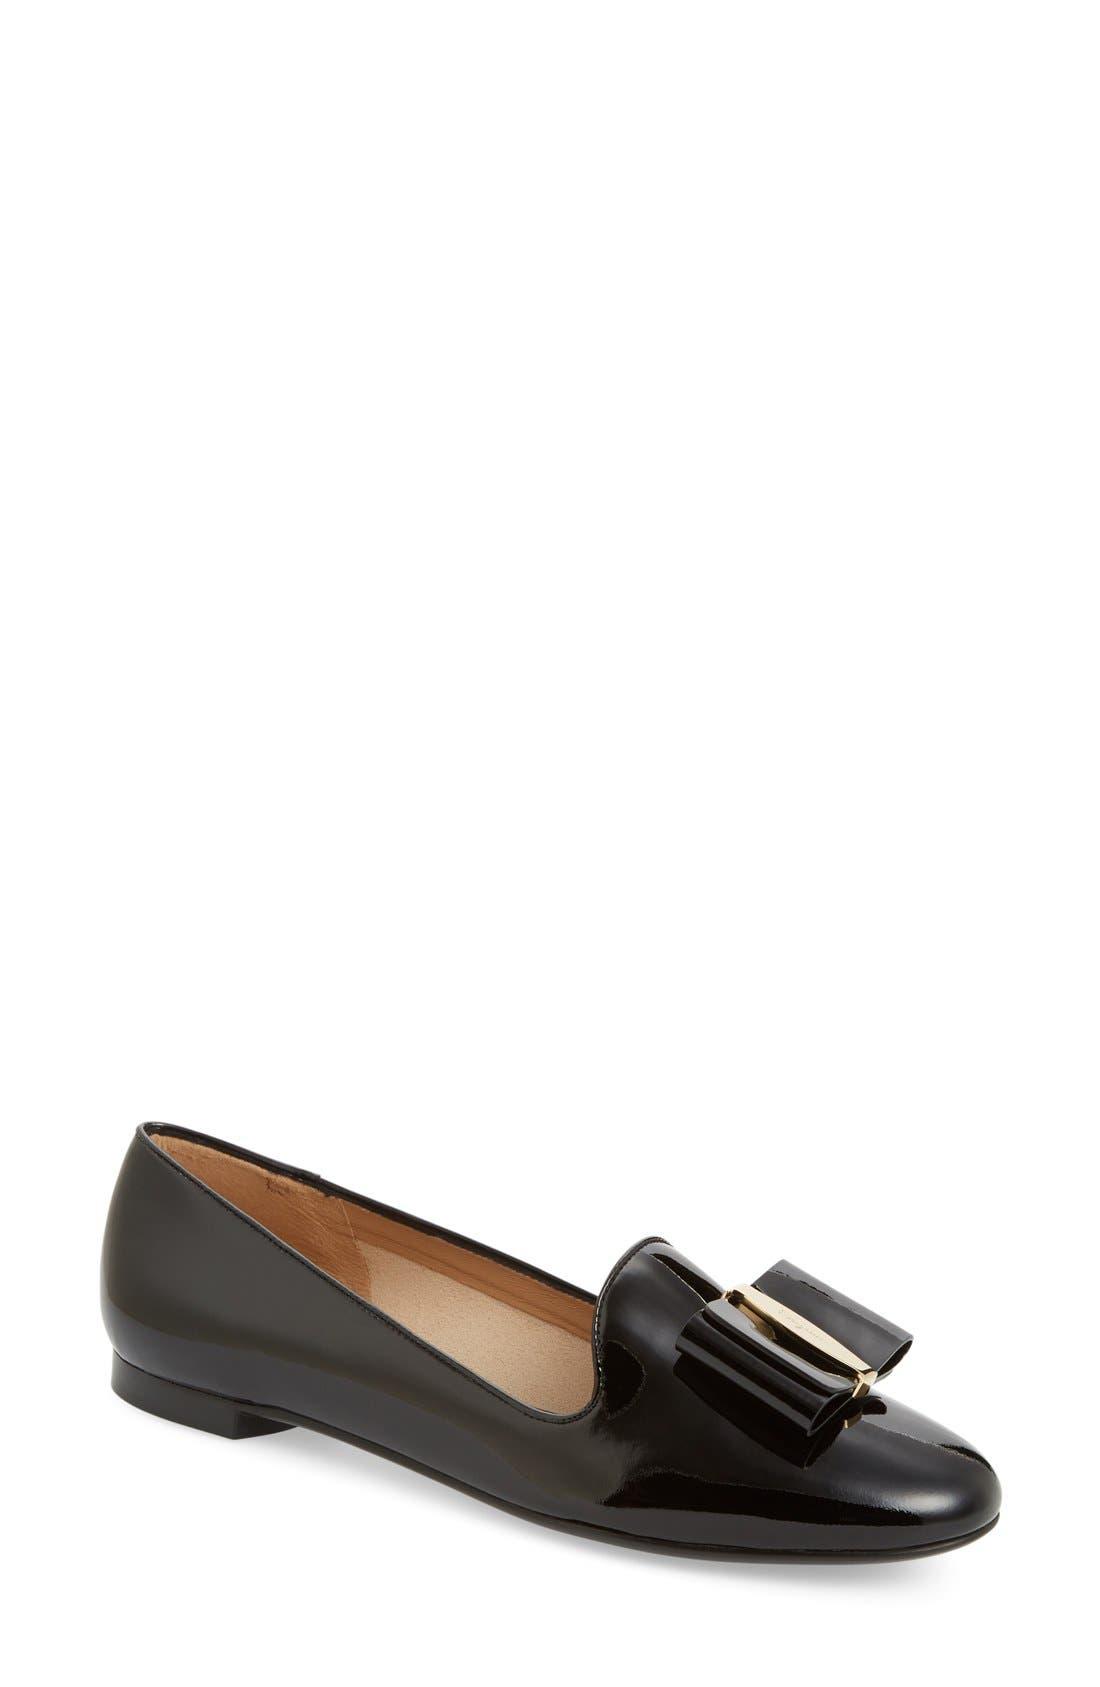 Salvatore Ferragamo Bow Smoking Loafer (Women)